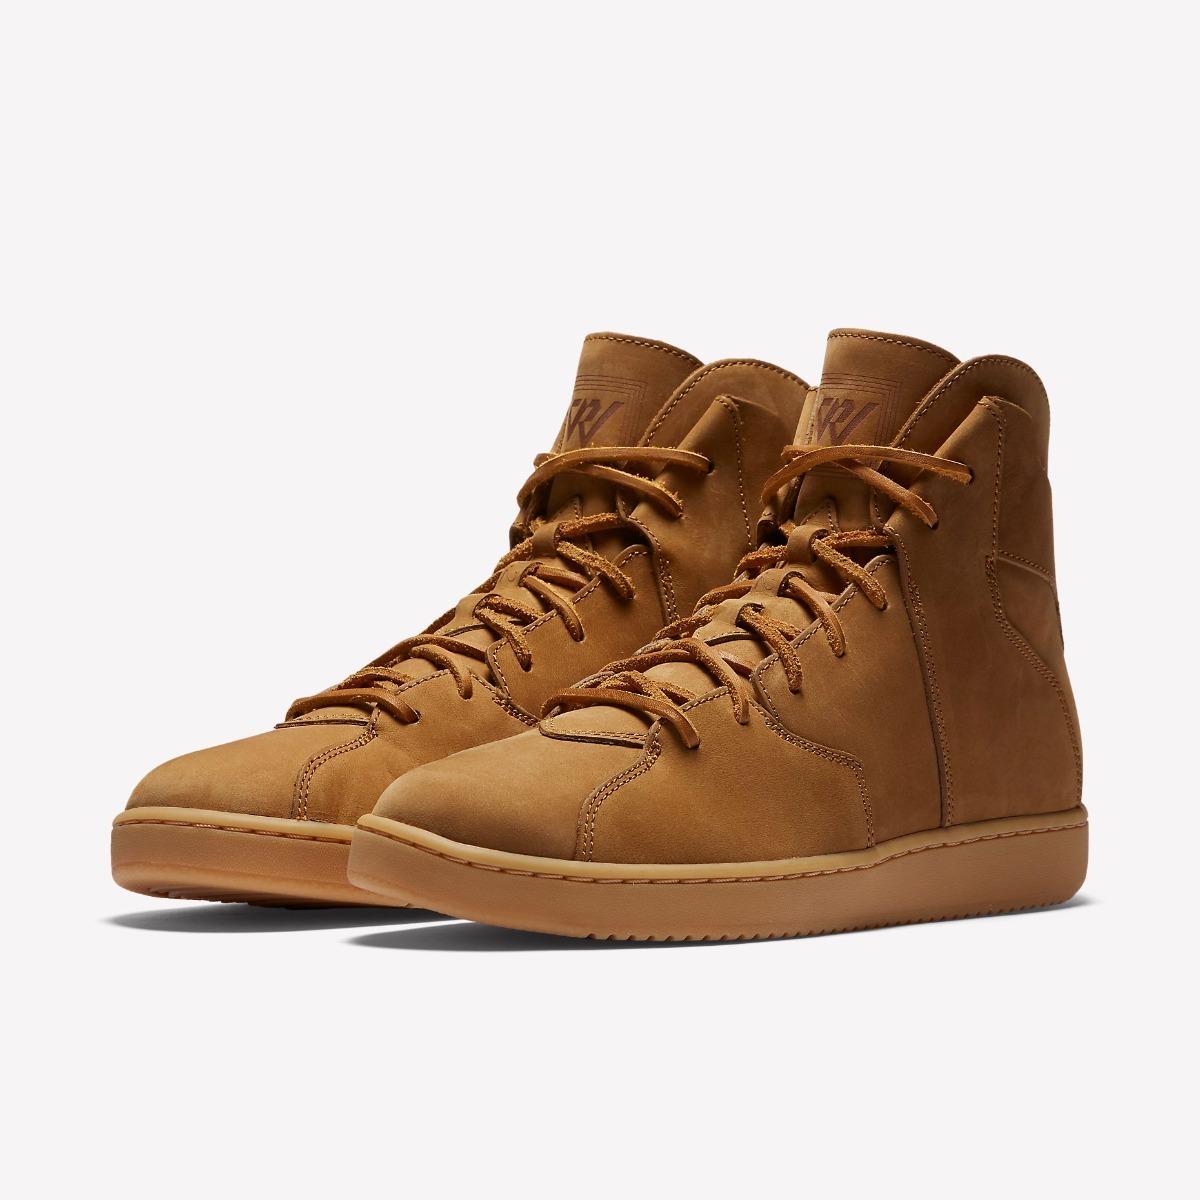 Zapatillas Nike Jordan Westbrook 0.2 | Wheat 2017 Original